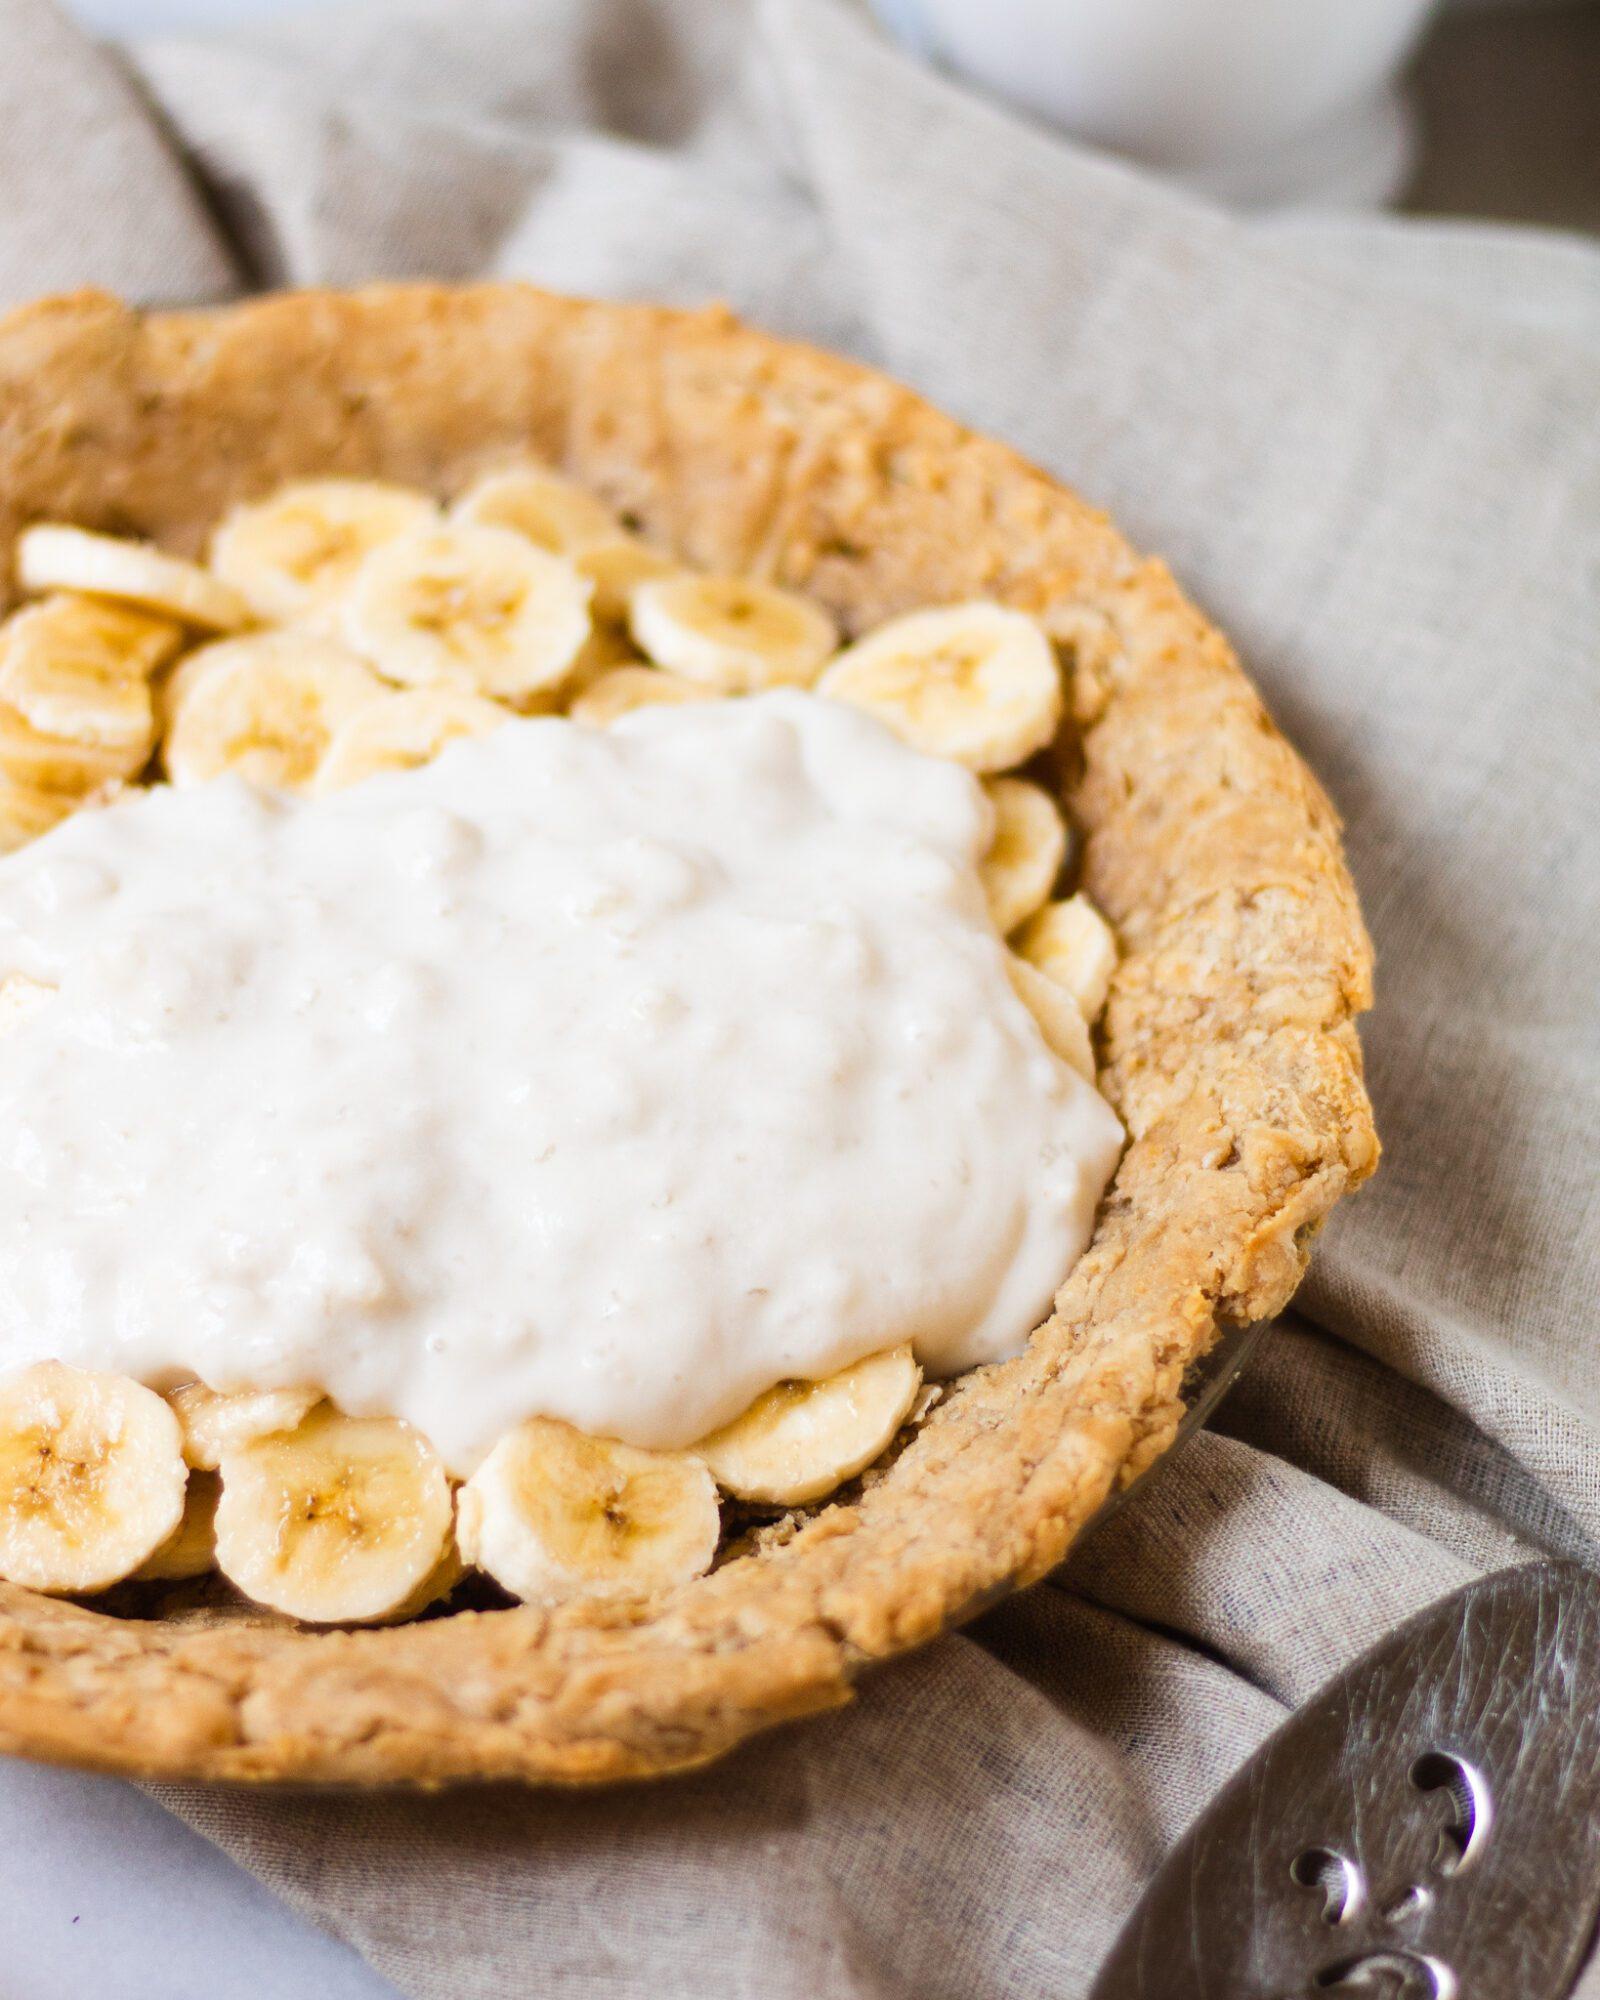 vanilla pudding on banana cream pie